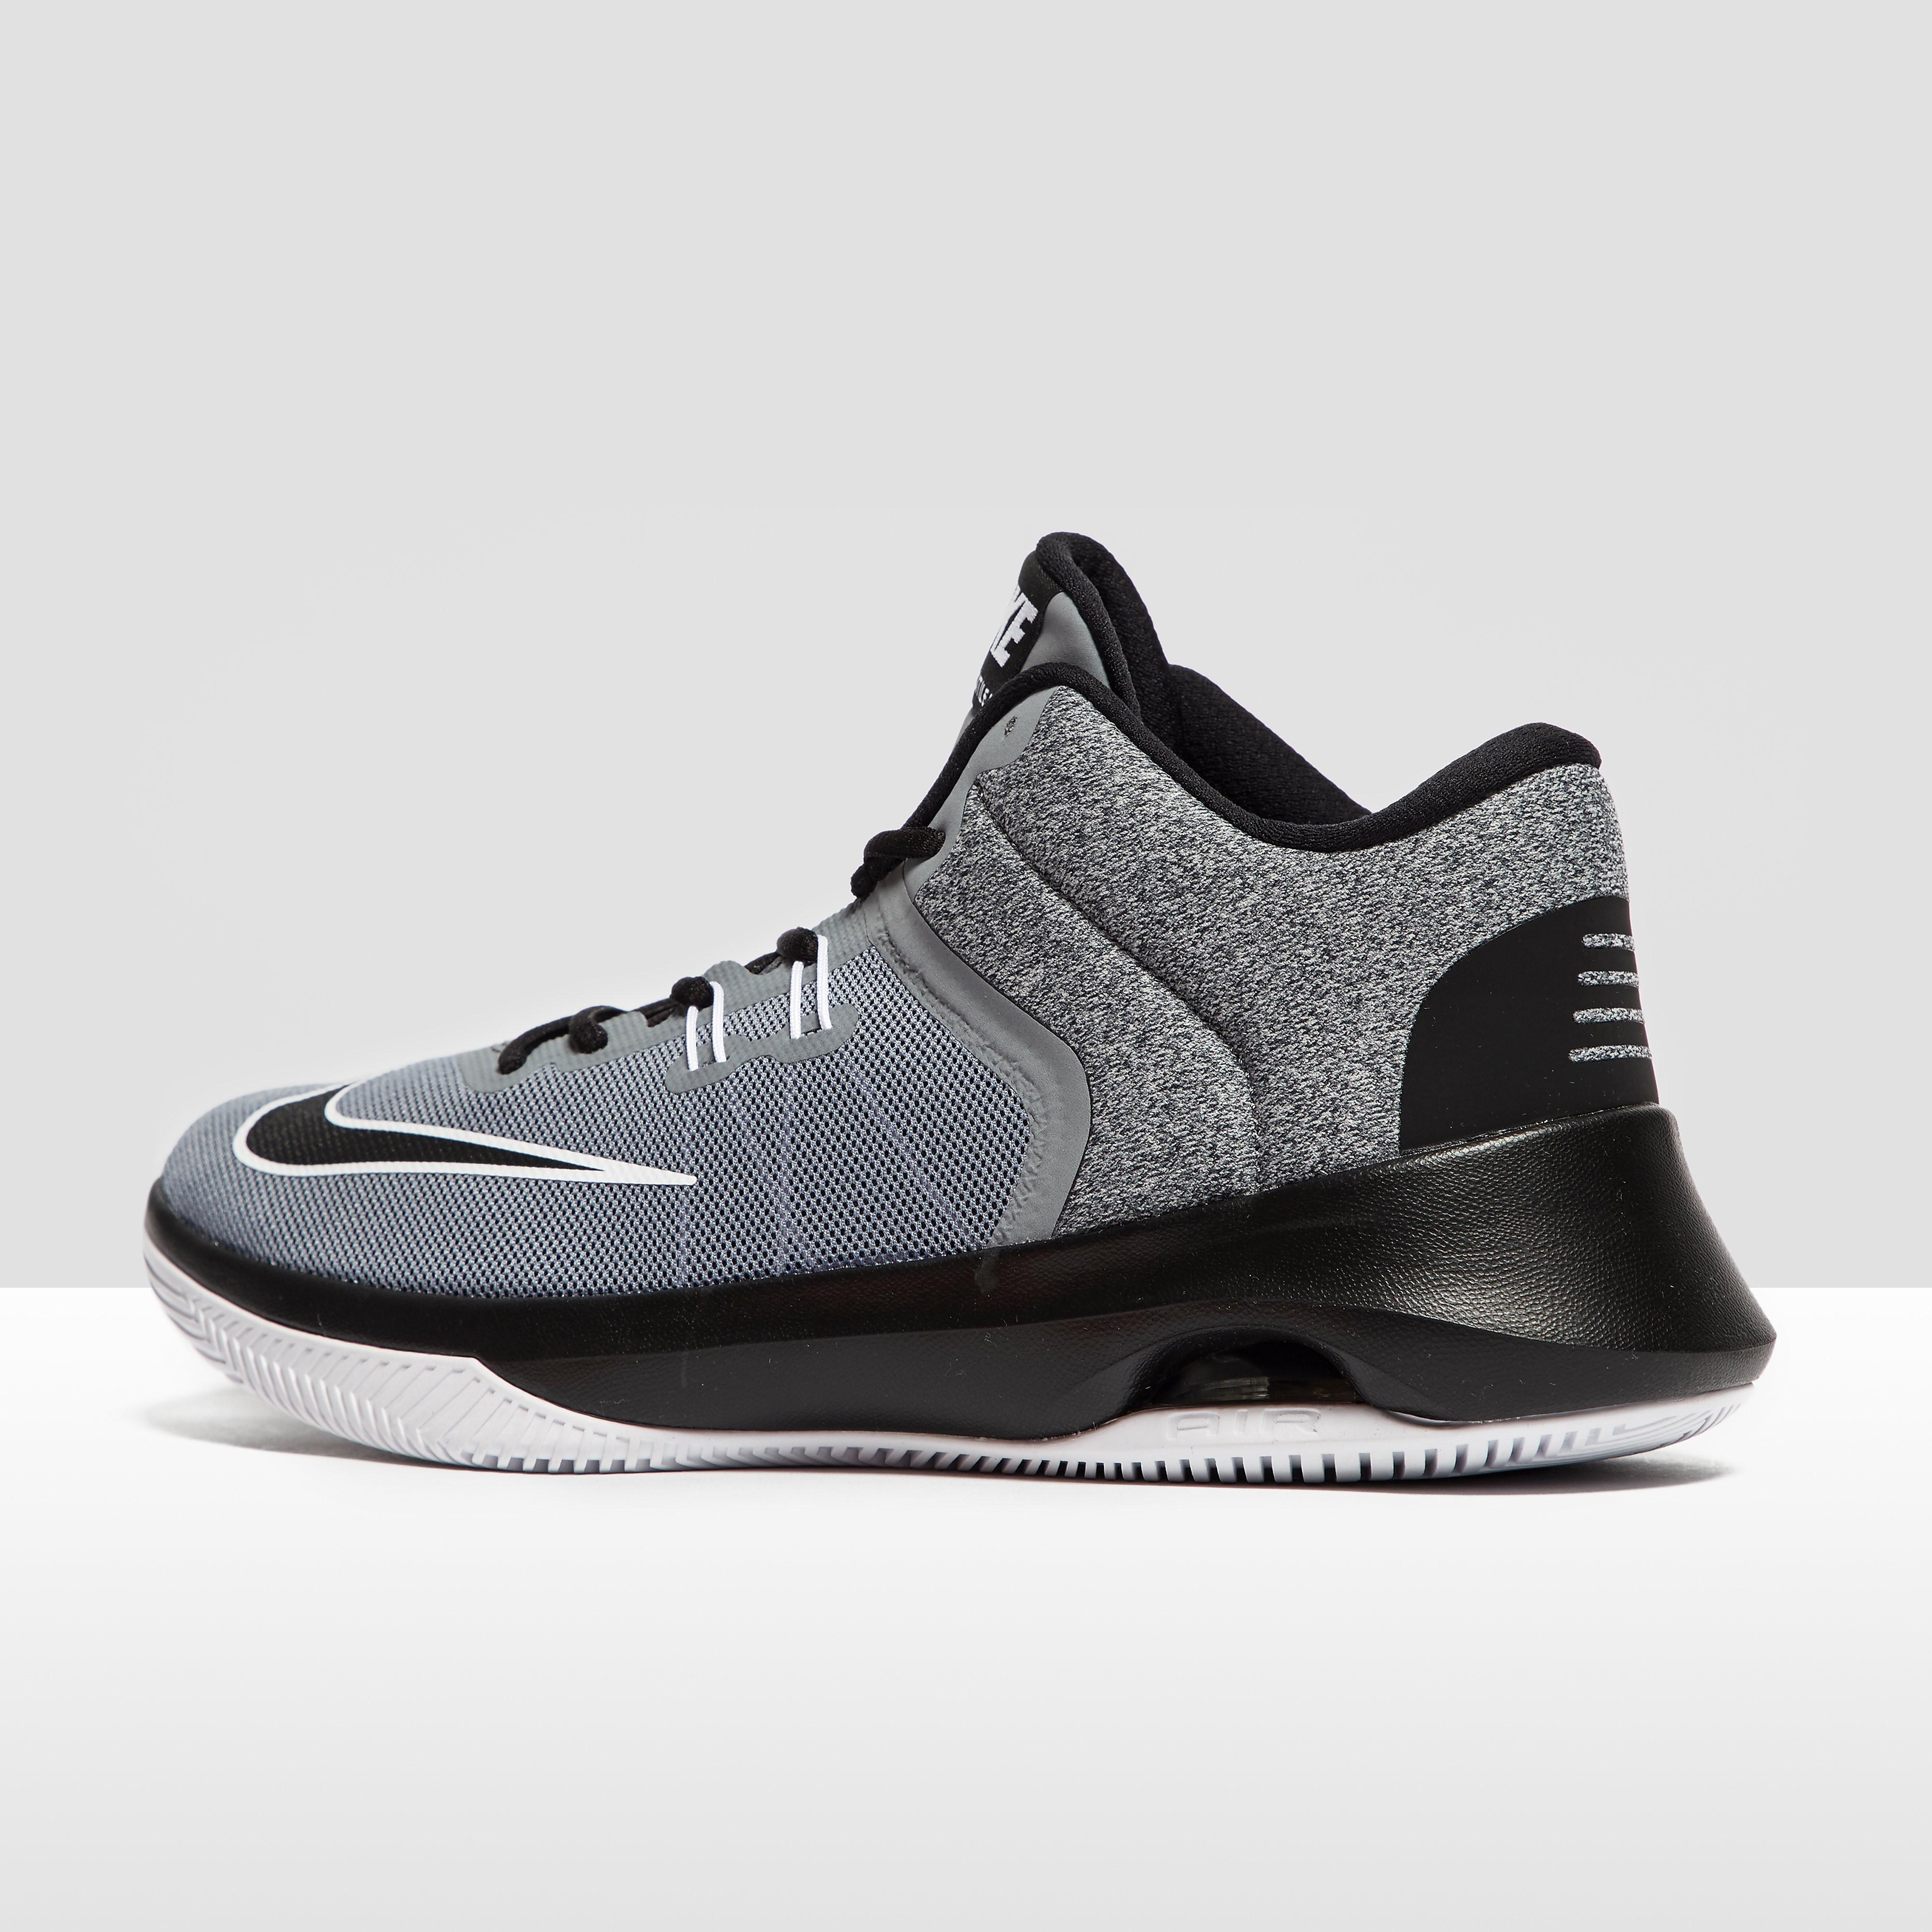 Nike Men's Nike Air Versitile II Basketball Shoes